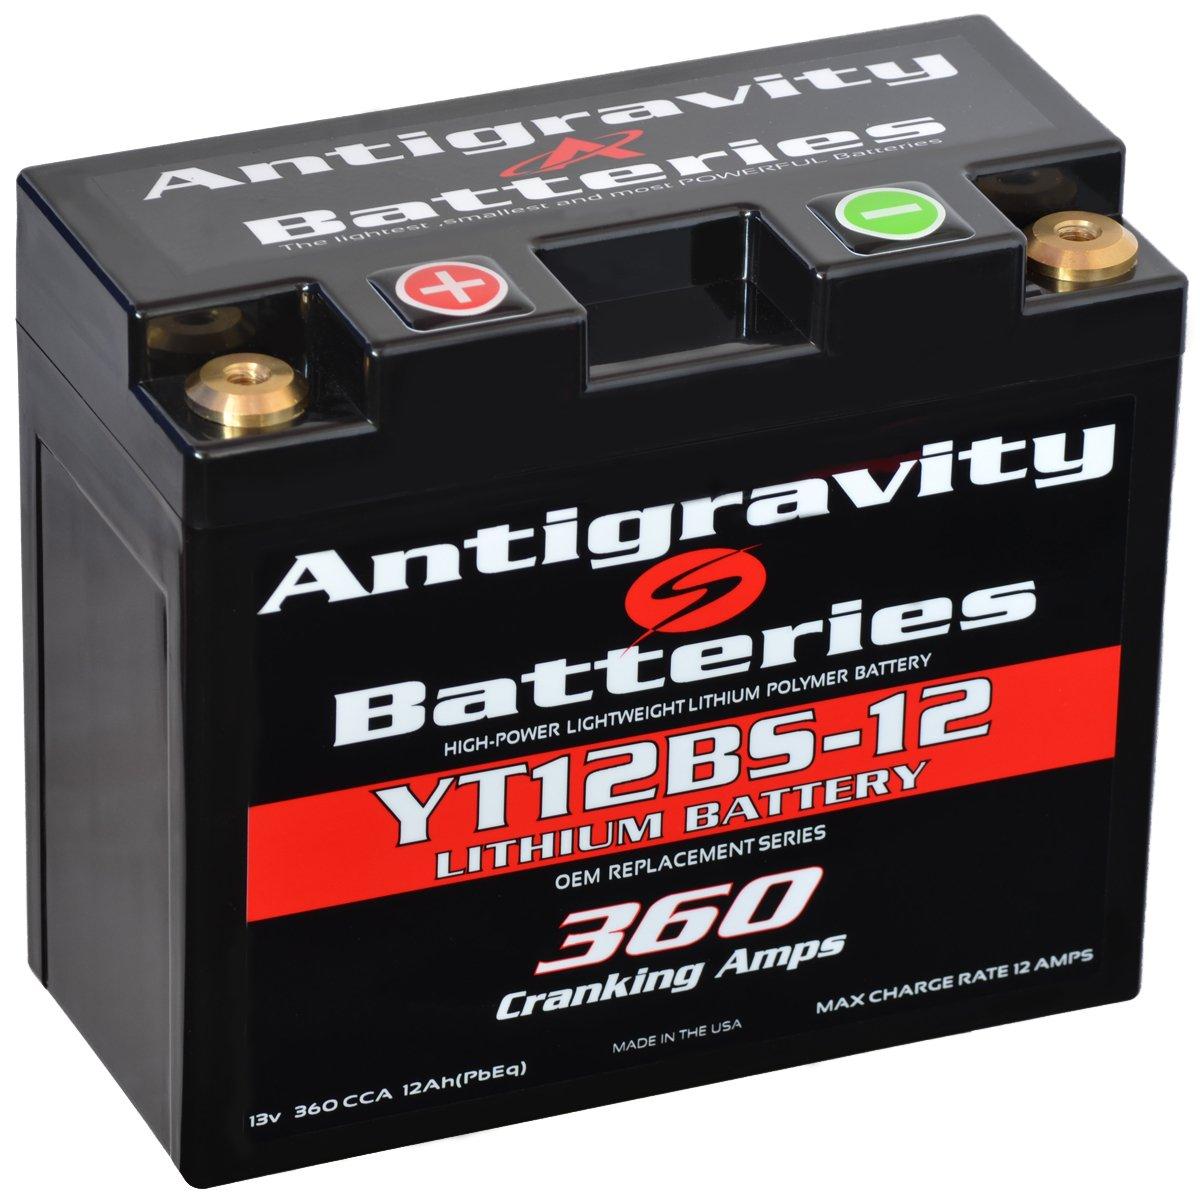 Anti Gravity (アンチ グラビティー) バッテリー YT12-BS OEM case 12cell 5-7/8